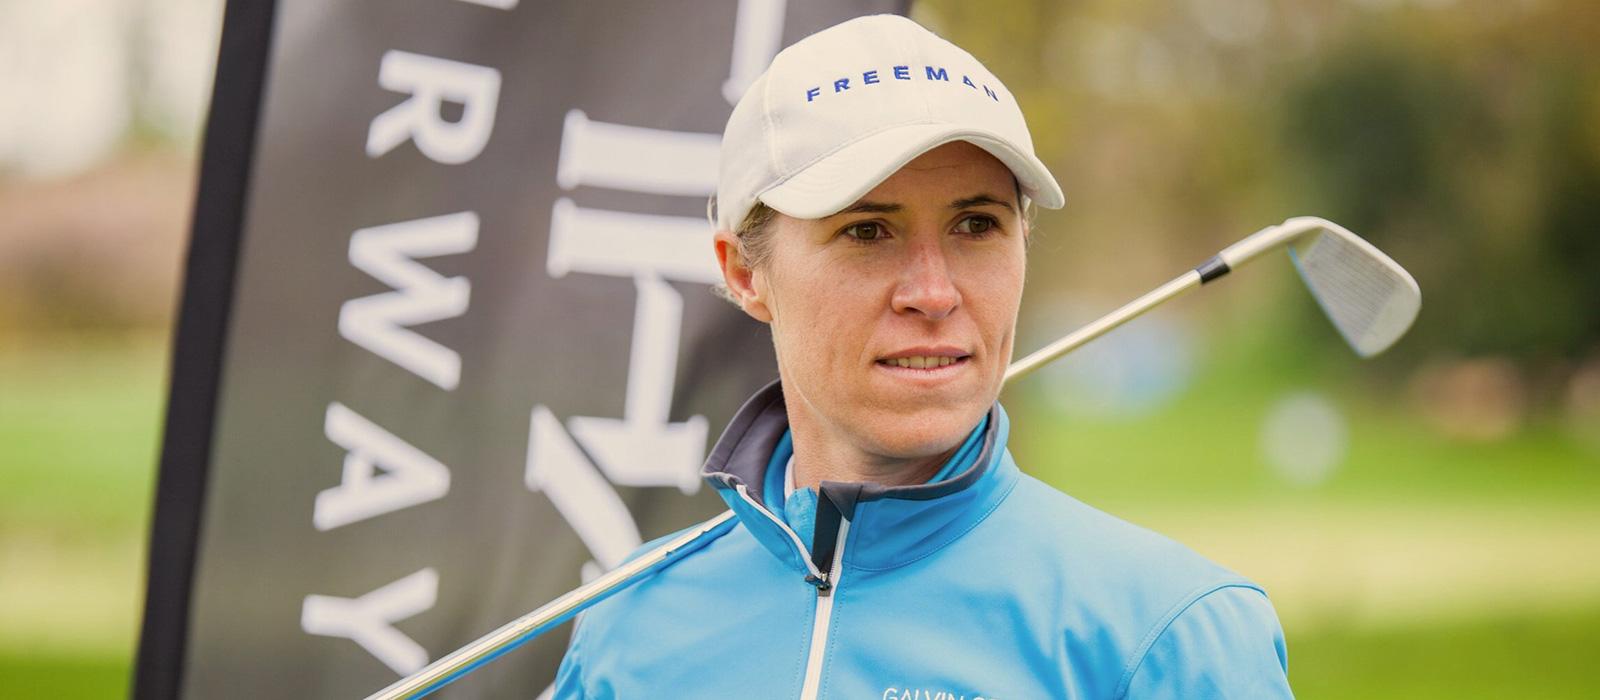 Sophie Walker on Golf in Scotland